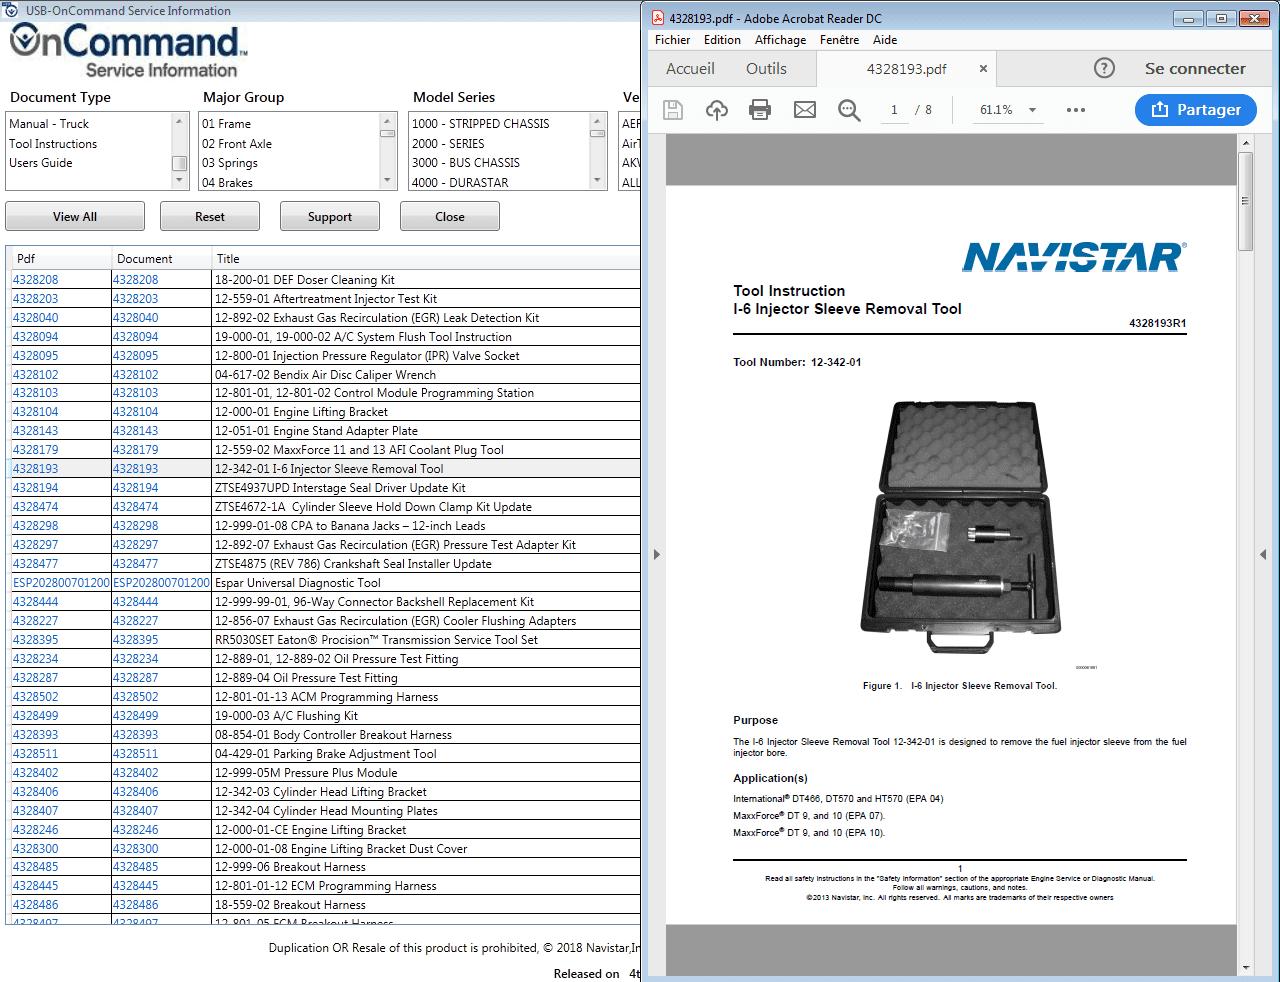 navistar ht 570 engine diagram navistar oncommand service information 2018 auto repair software  navistar oncommand service information